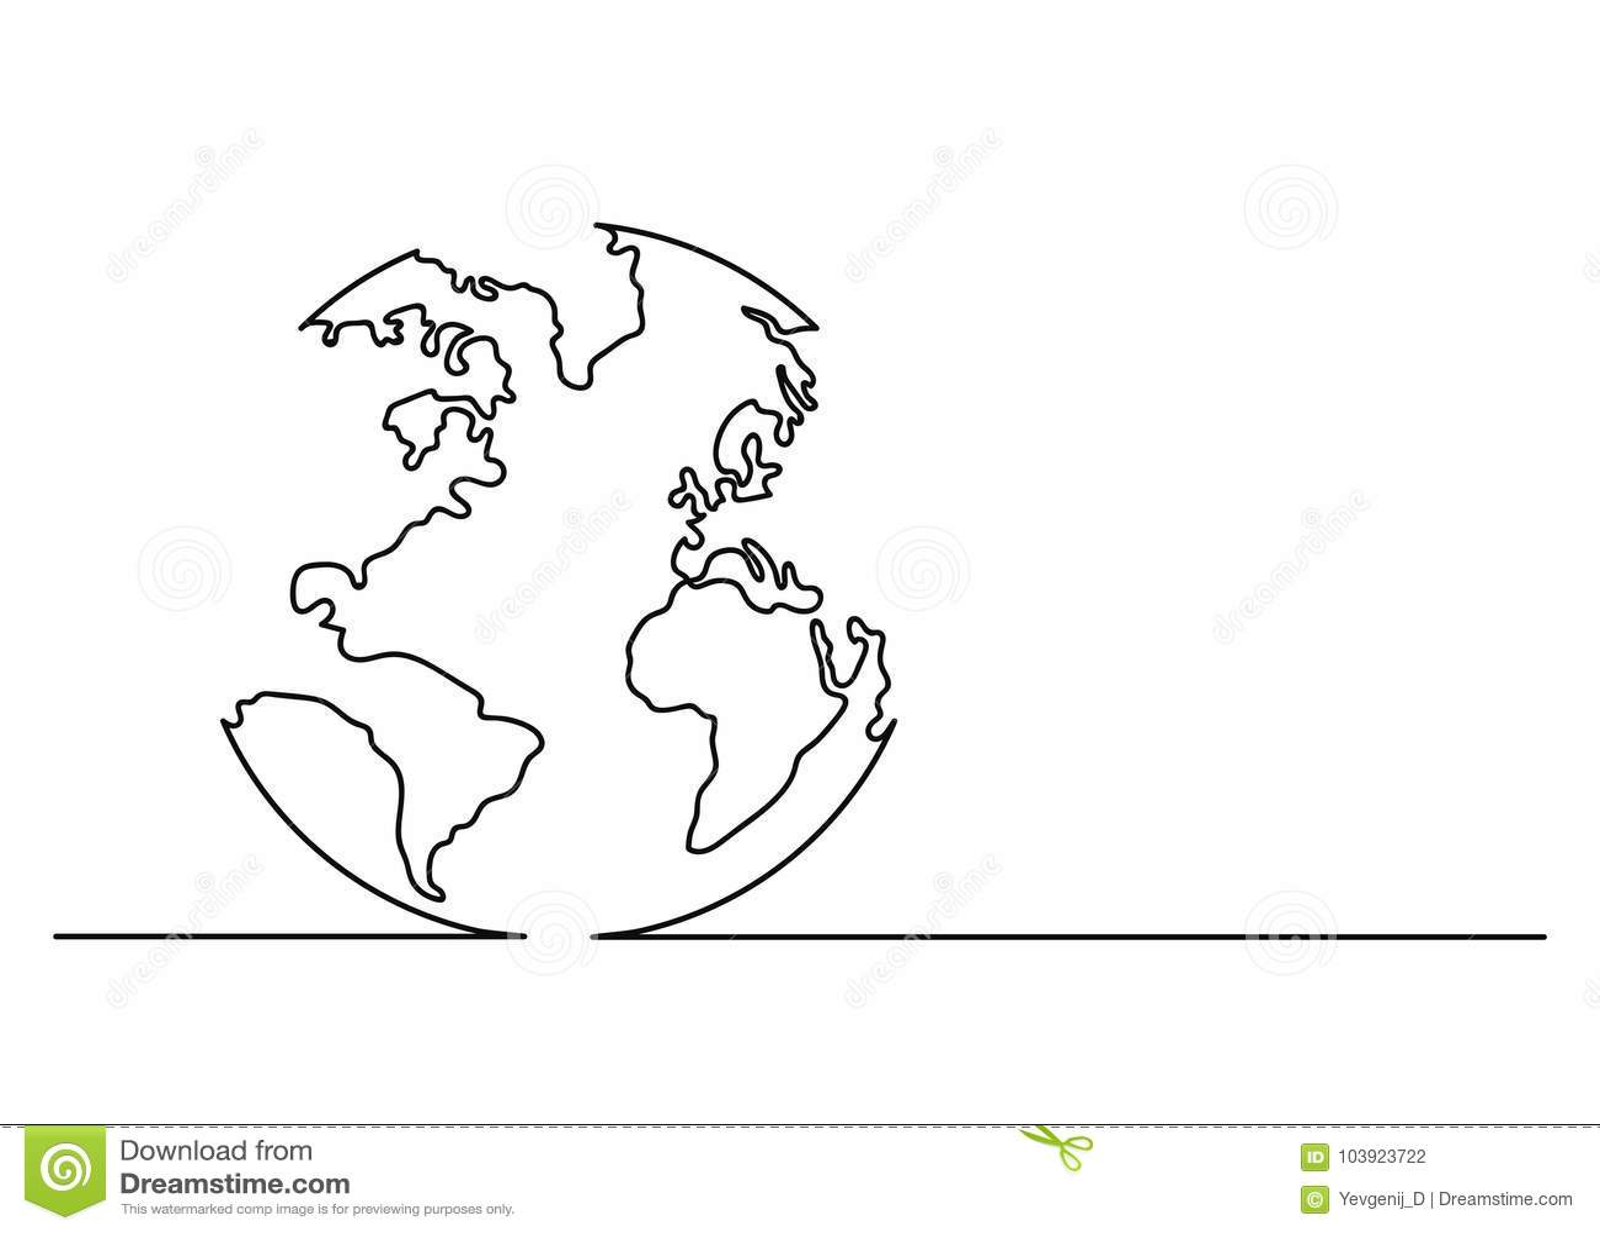 Jordklotsymbol i linjen konststil Planetjordsymbol Fortlöpande linje teckning Singel obruten linje teckningsstil